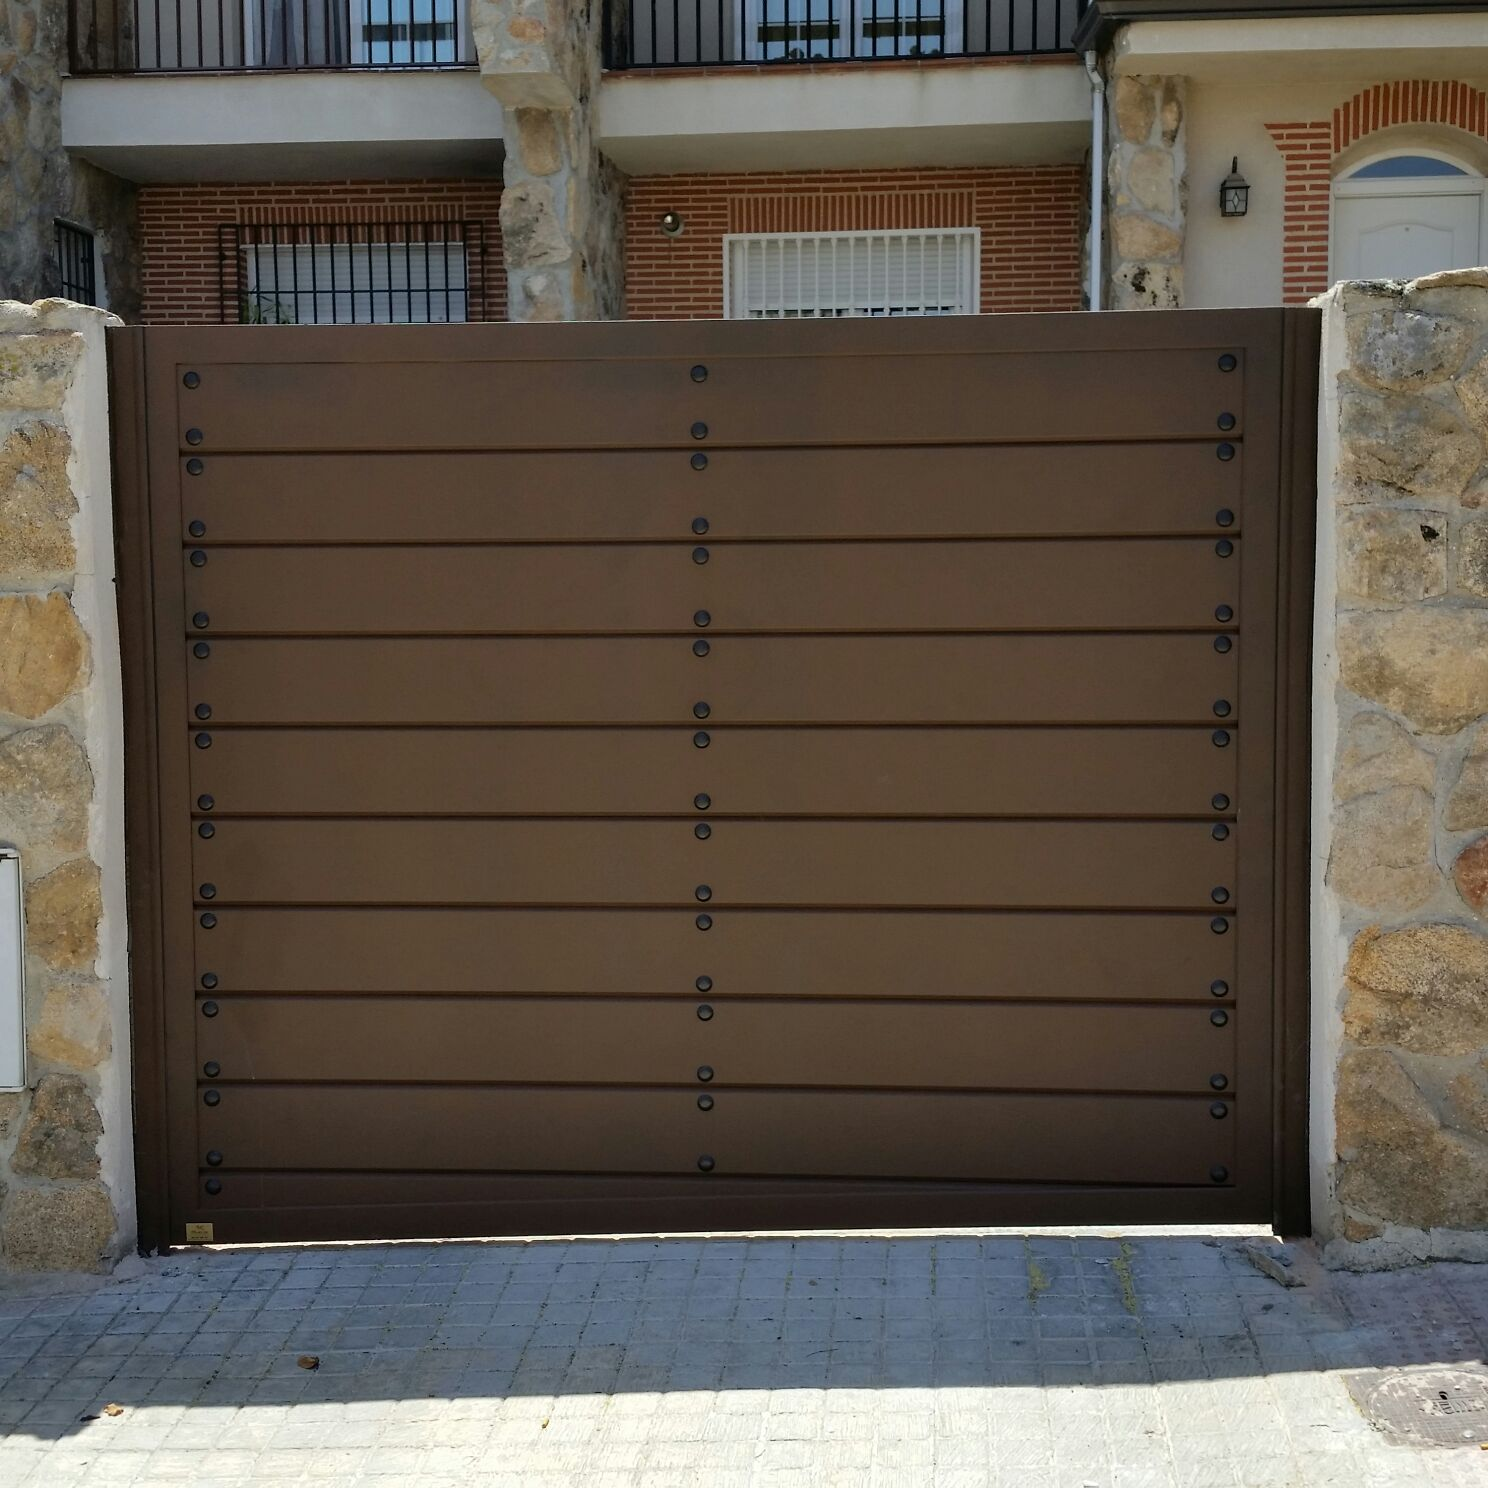 Puertas de aluminio para exterior modelo navalcarnero for Puertas metalicas modernas para exterior